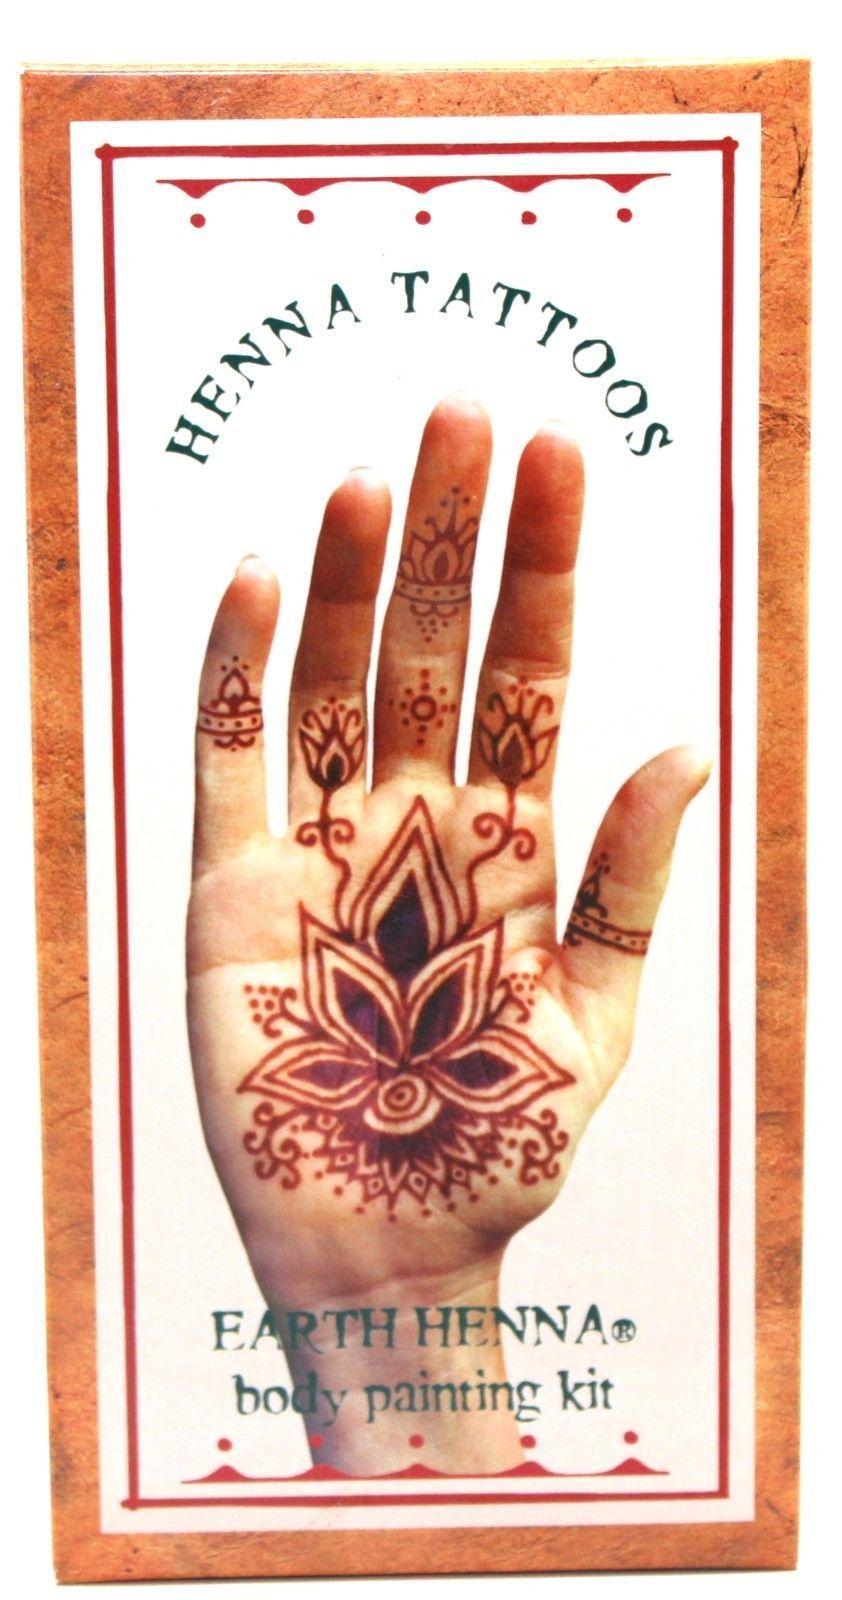 Henna Tattoo Kits For Kids: Details About Lakaye Studio Earth Henna Body Painting Kit